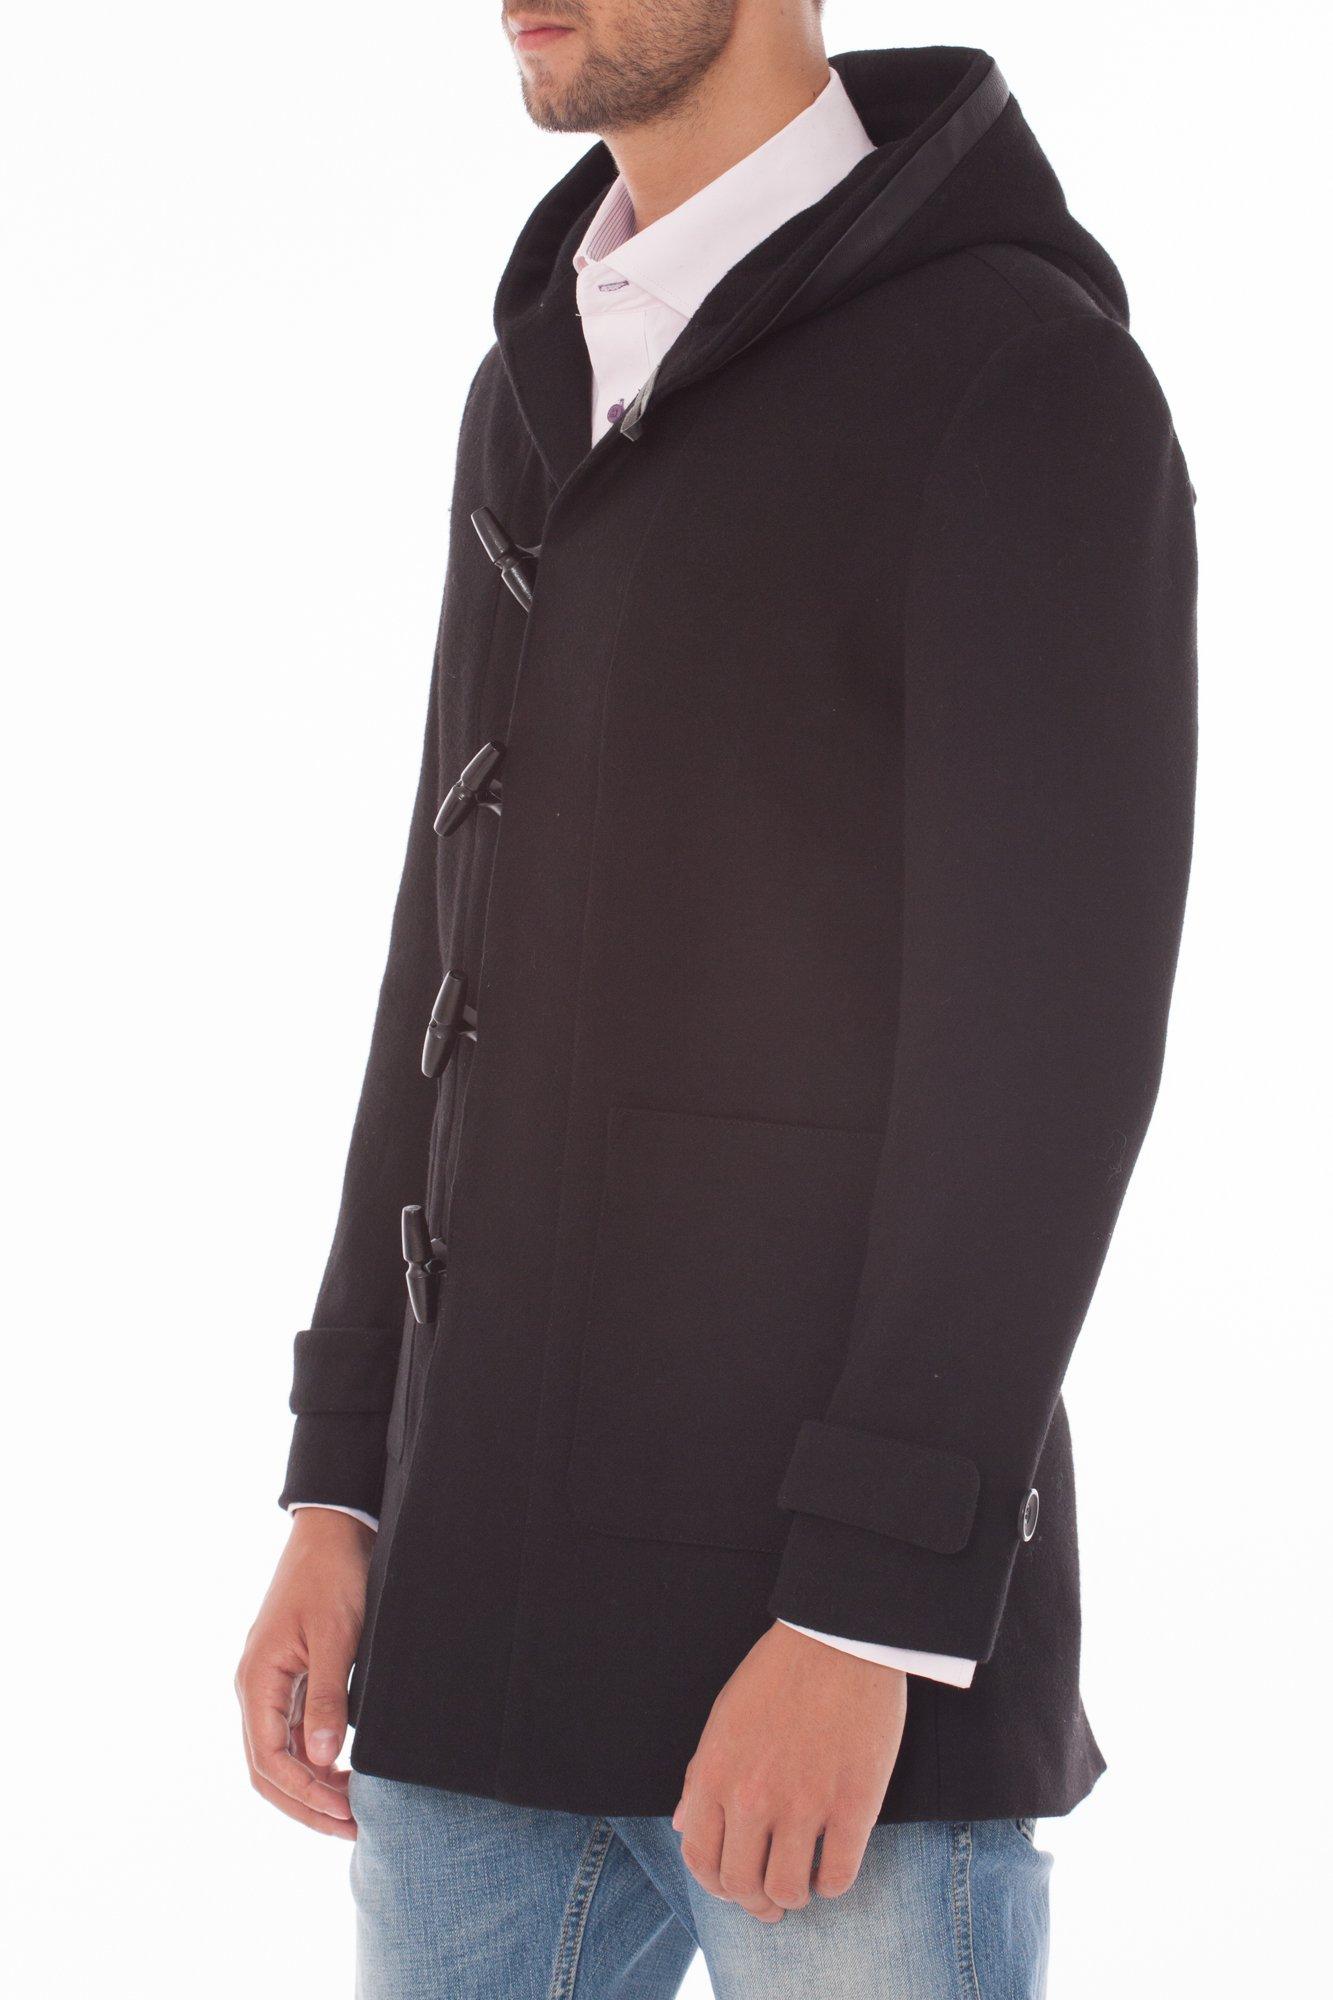 Jacheta neagra barbati cu gluga marca Grazie Filipeti